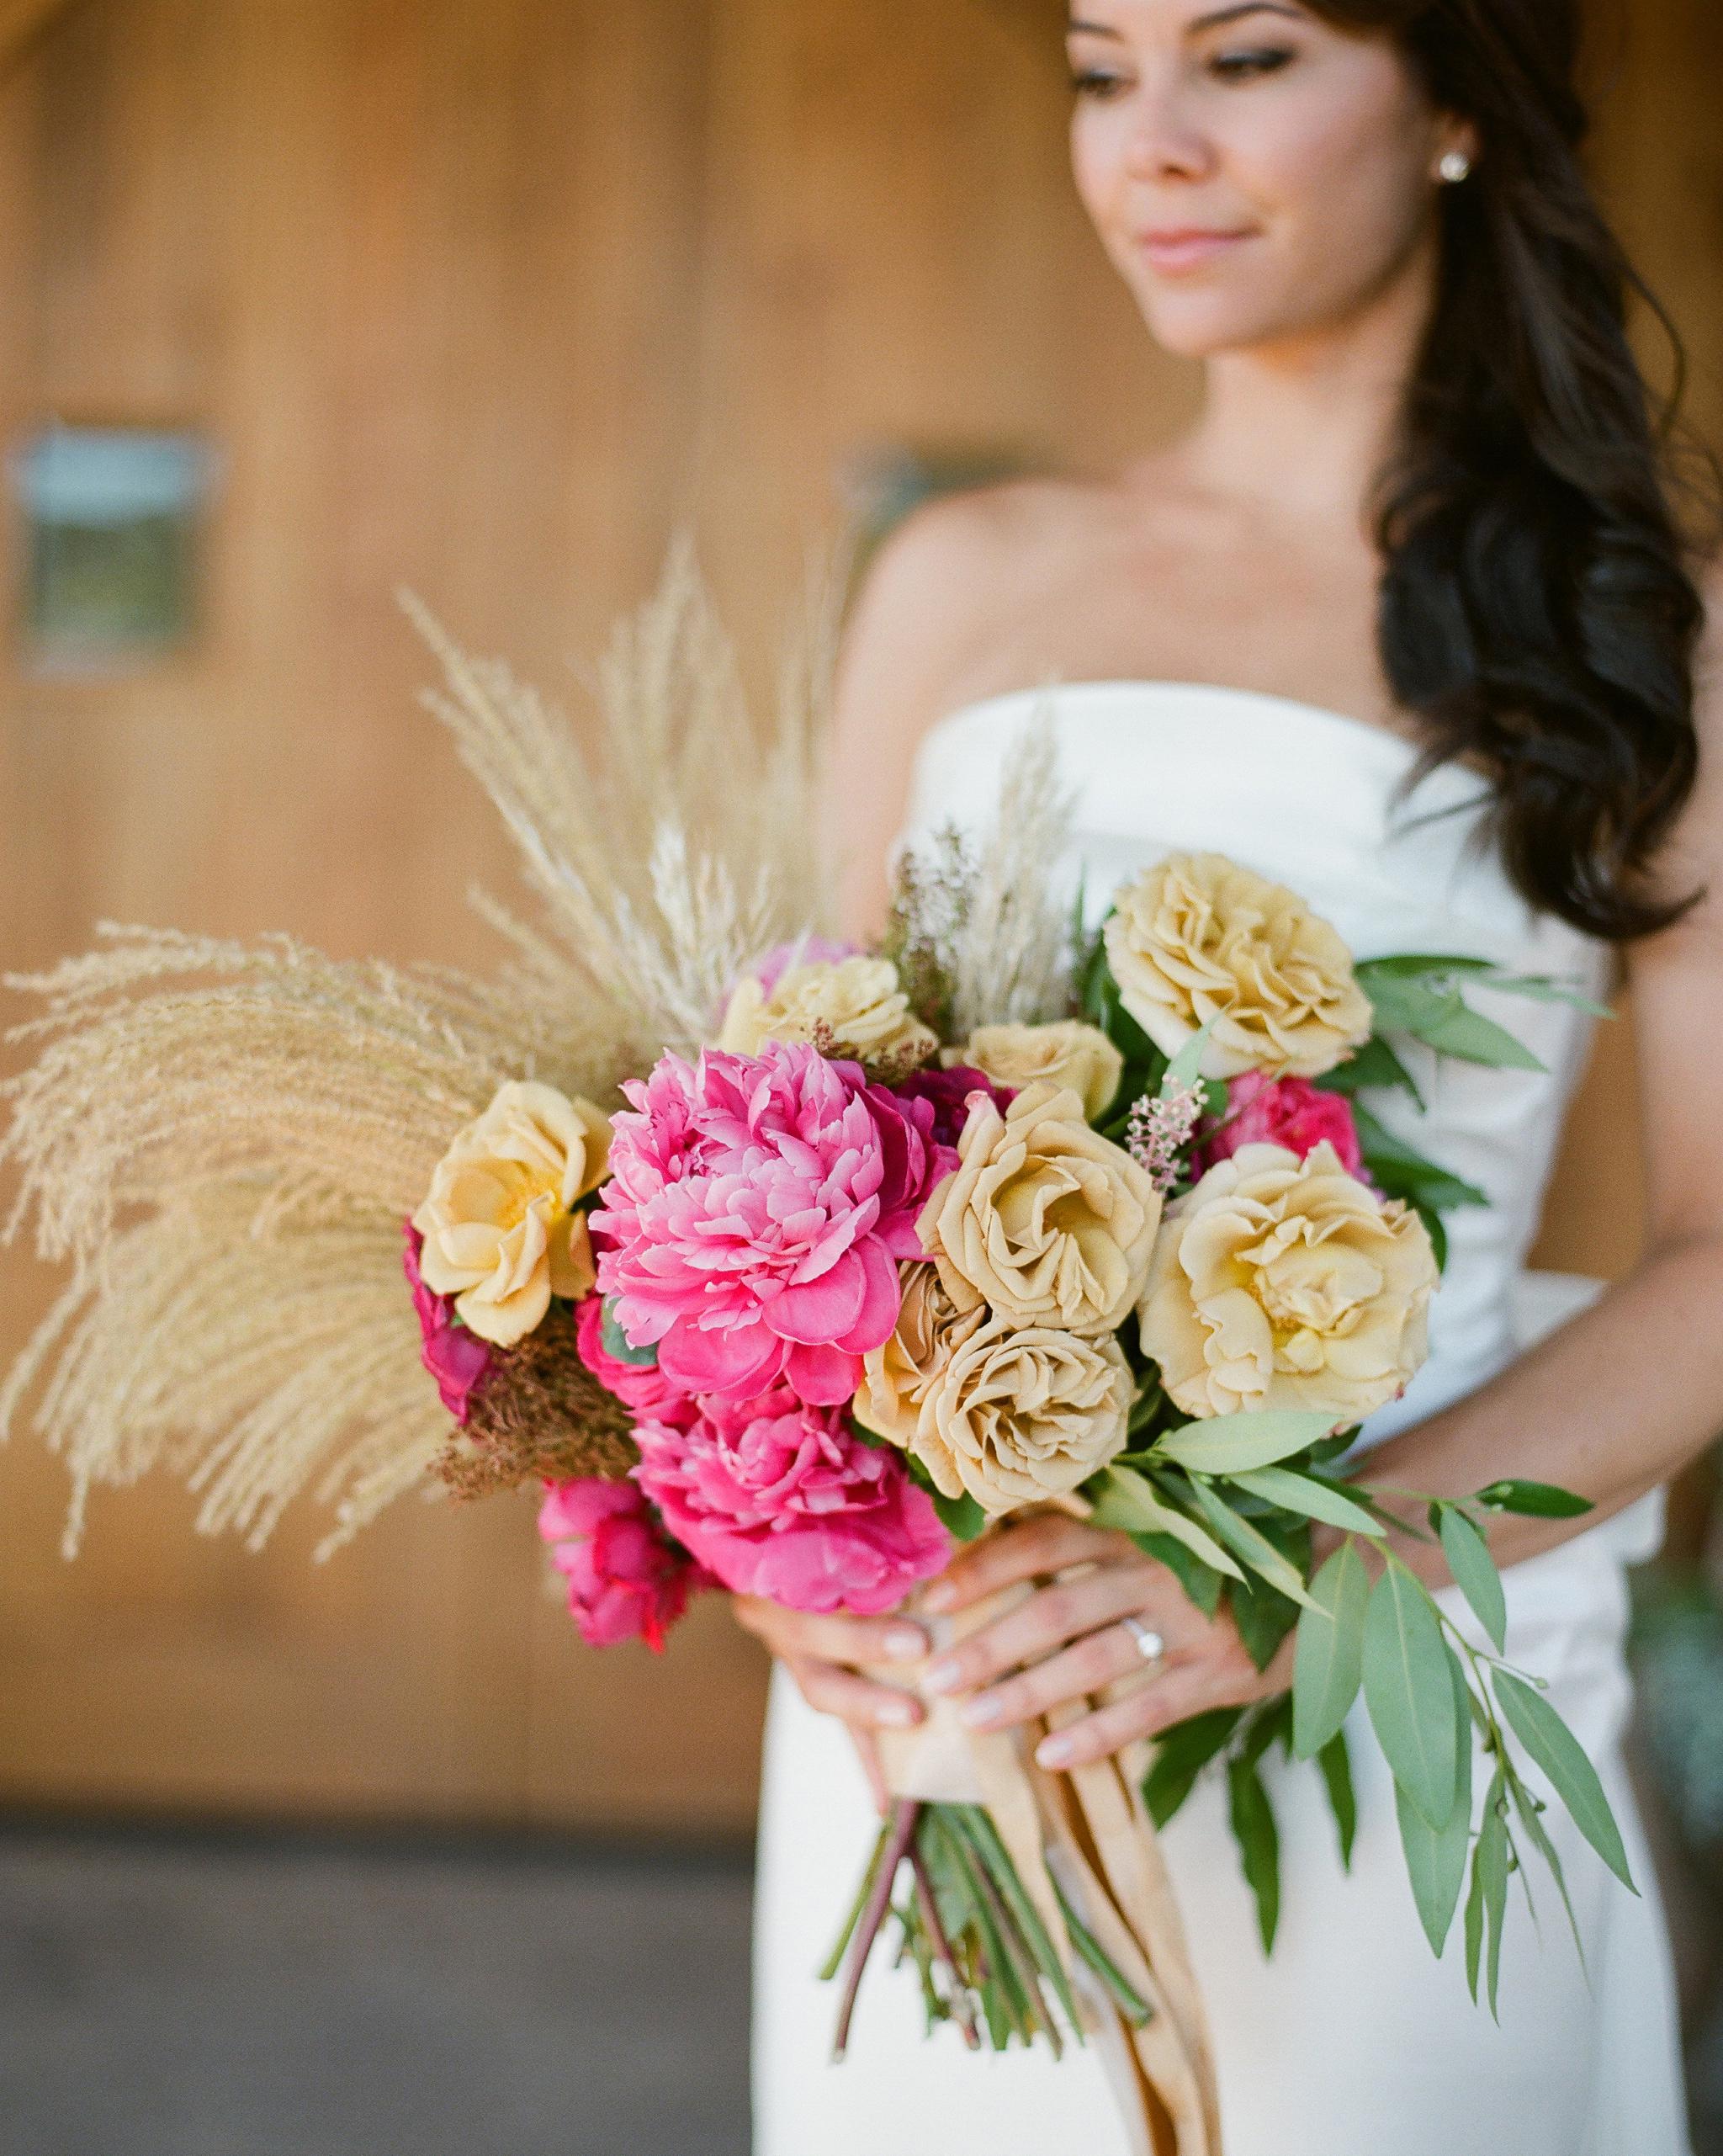 corrine-patrick-wedding-santa-ynez-44690009-s110842-0215.jpg